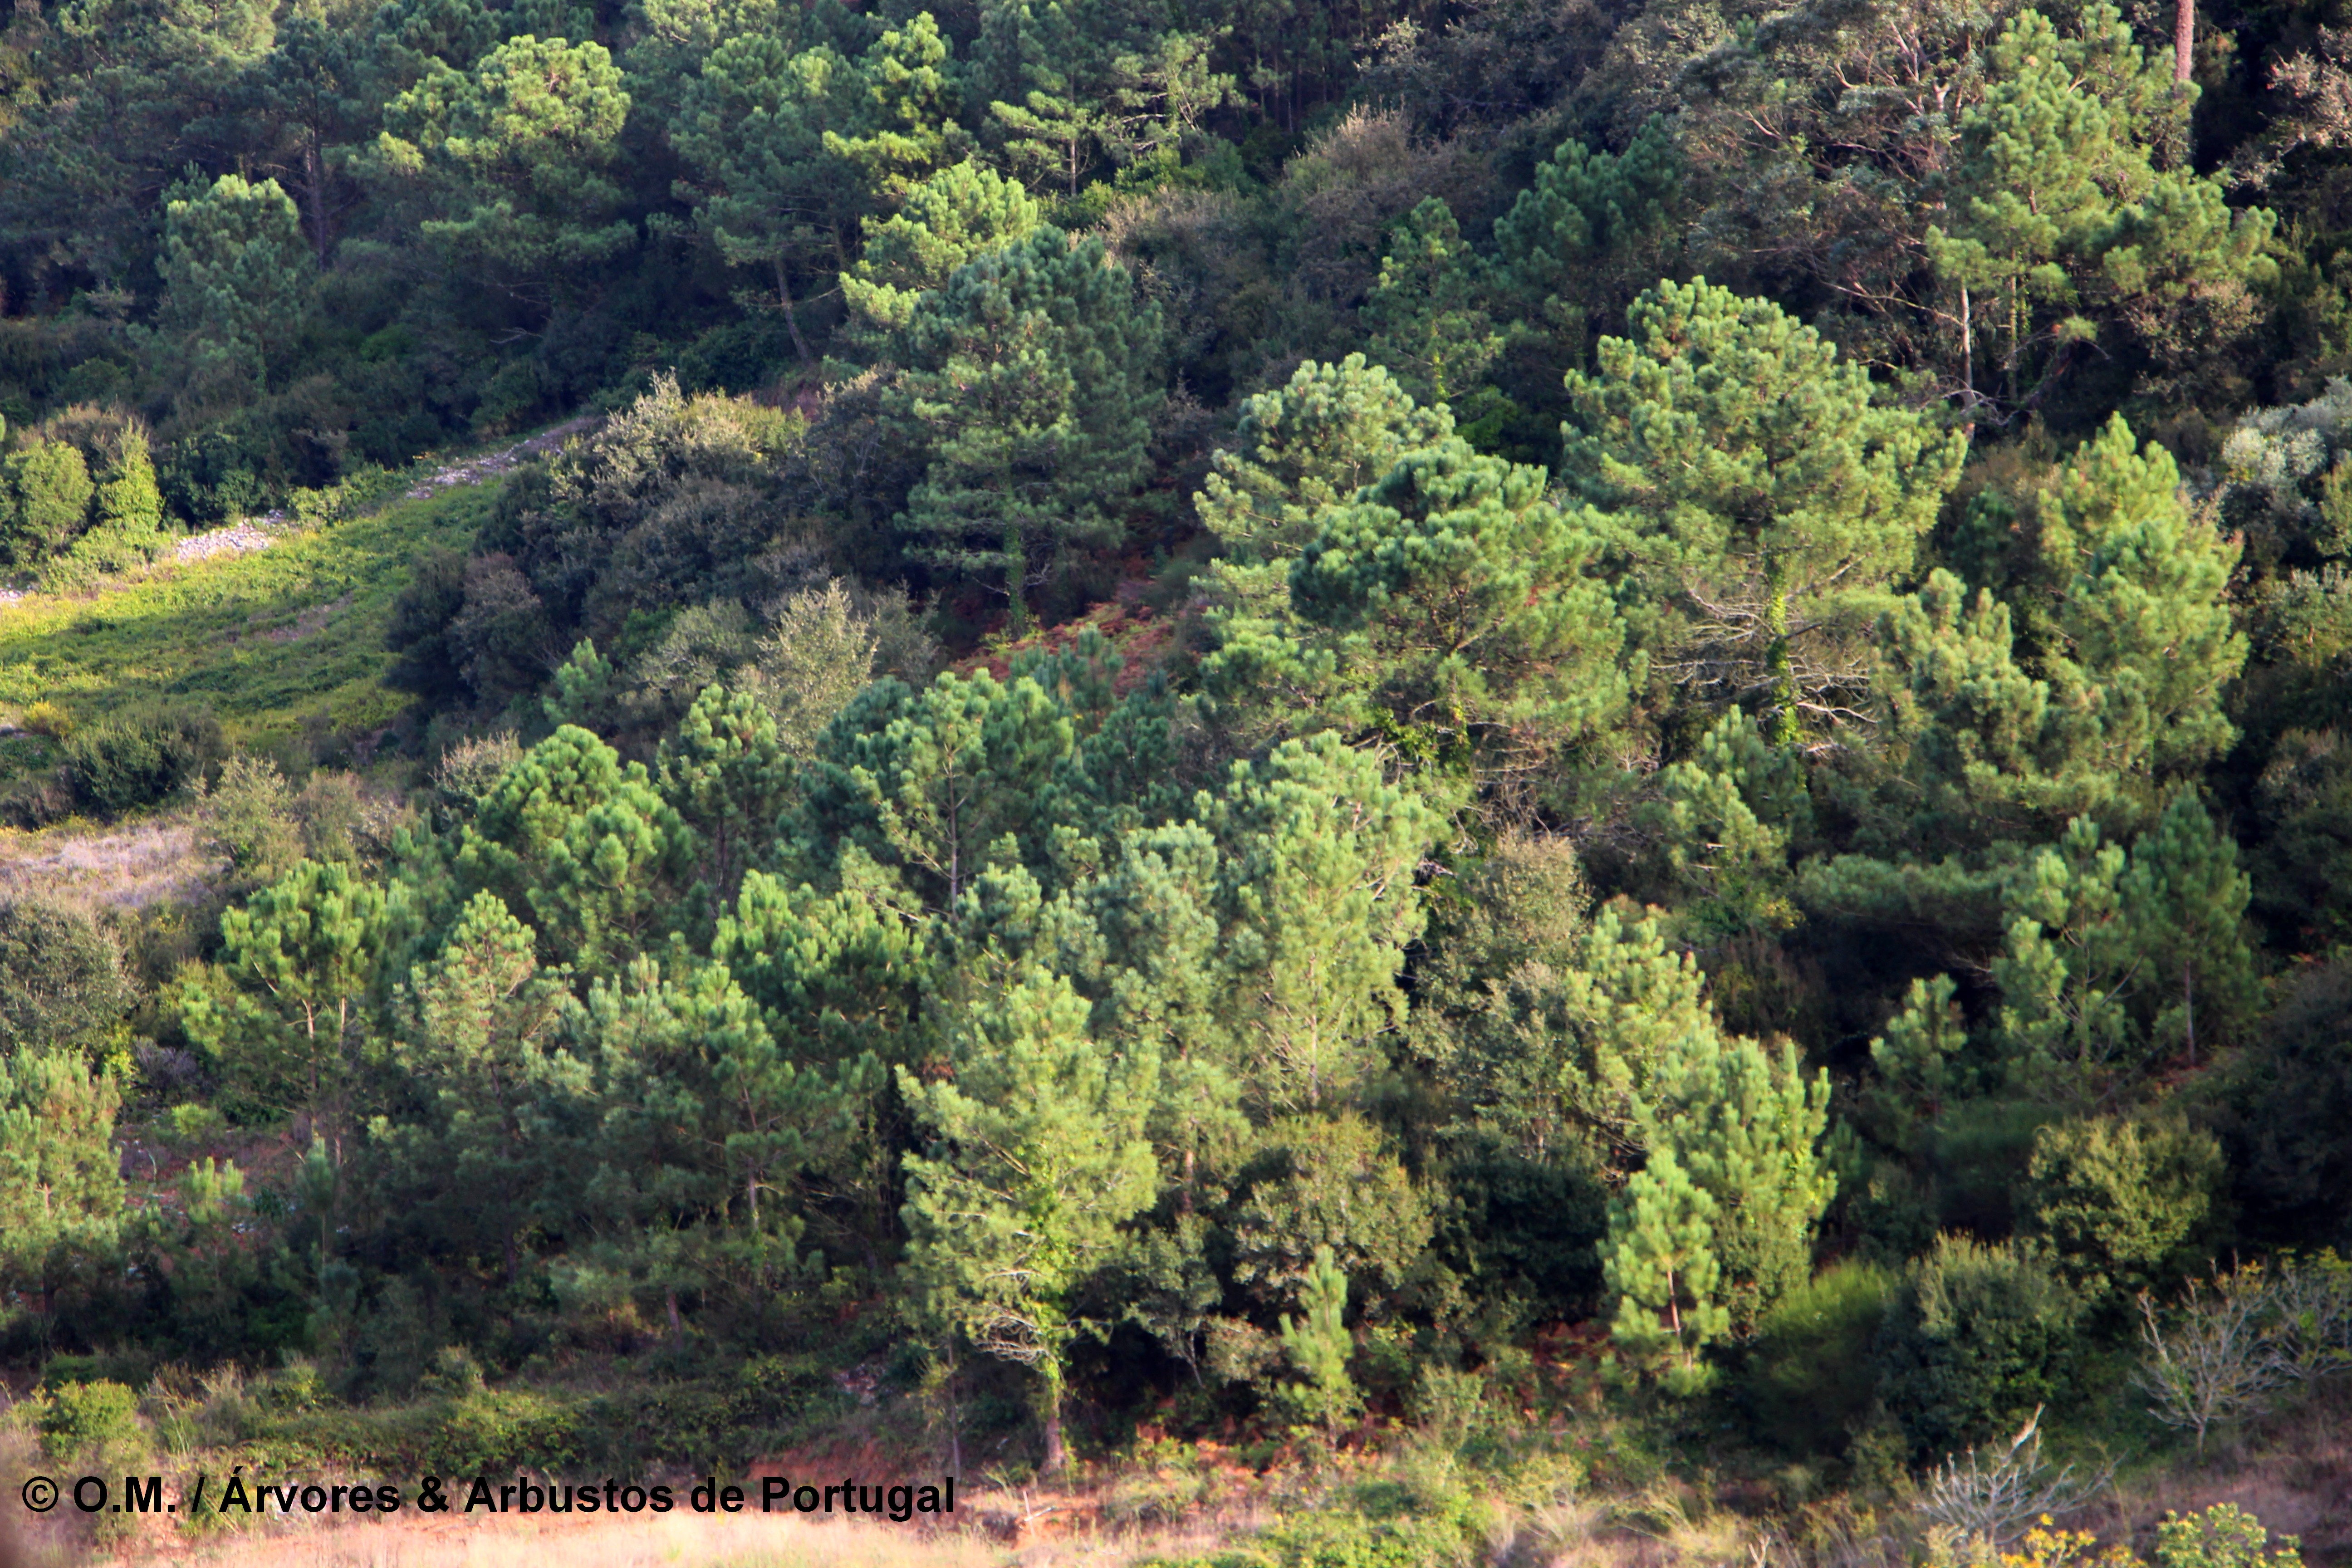 pinhal pinheiro-bravo, formação espontânea - Pinus pinaster